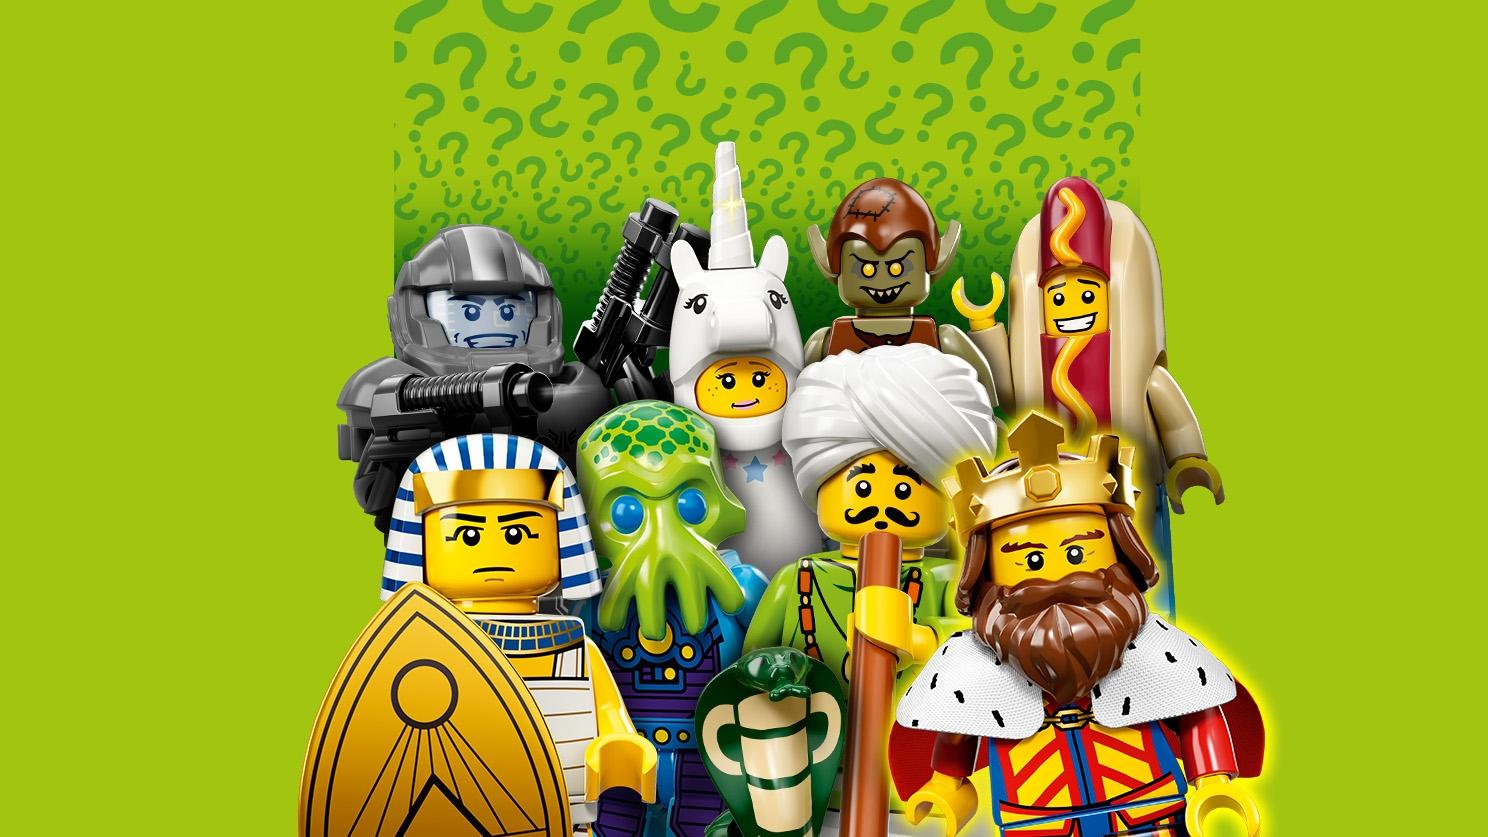 Lego CMF series 13 71008 minifigure SEALED choose 1 King Sheriff